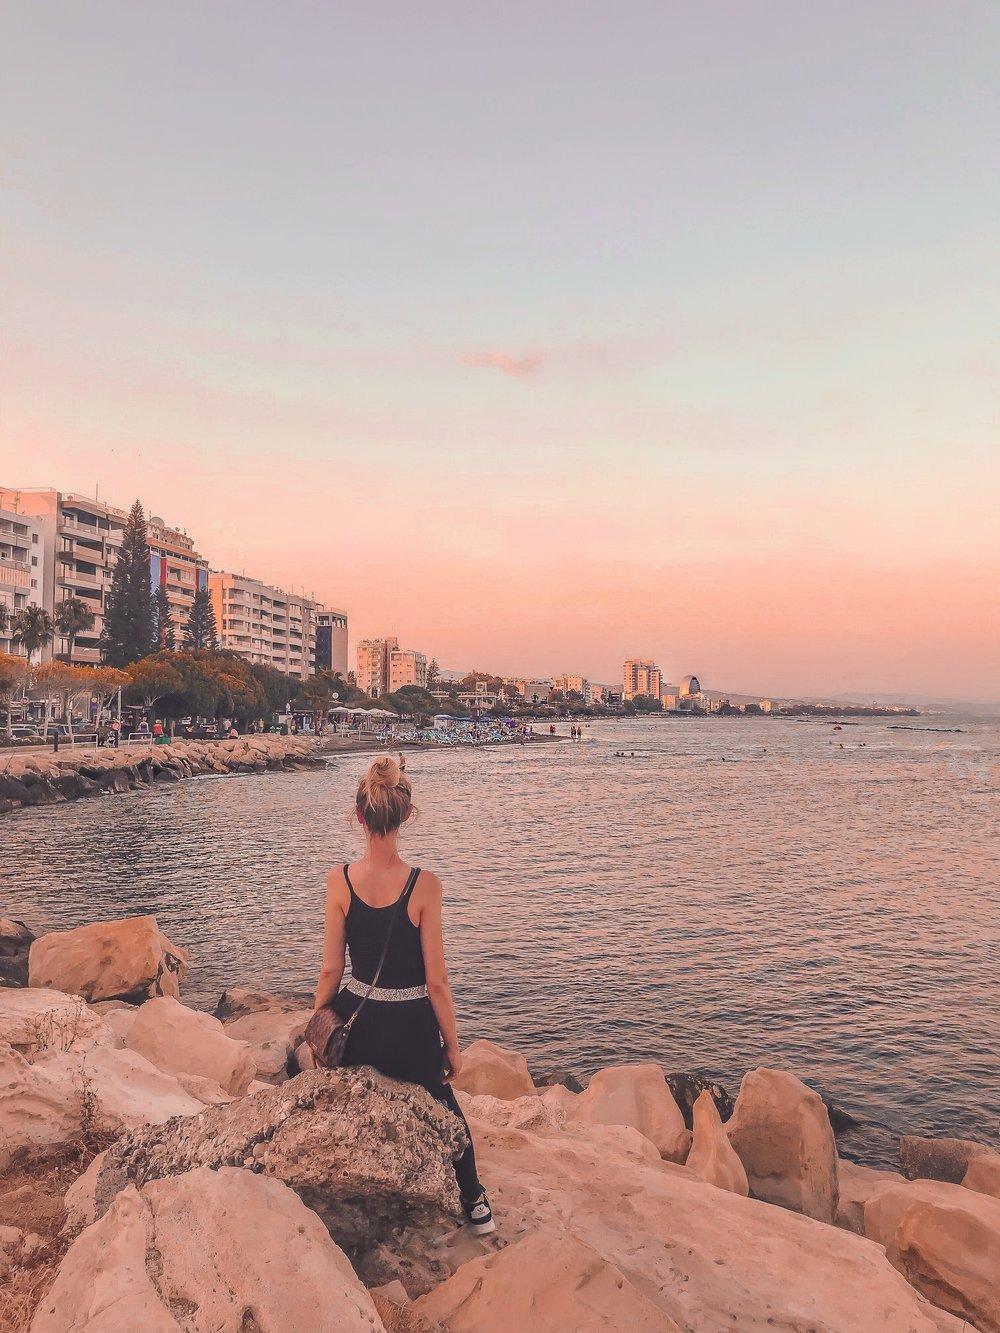 Power walk and Sunset at the beautiful Limassol beach promenade